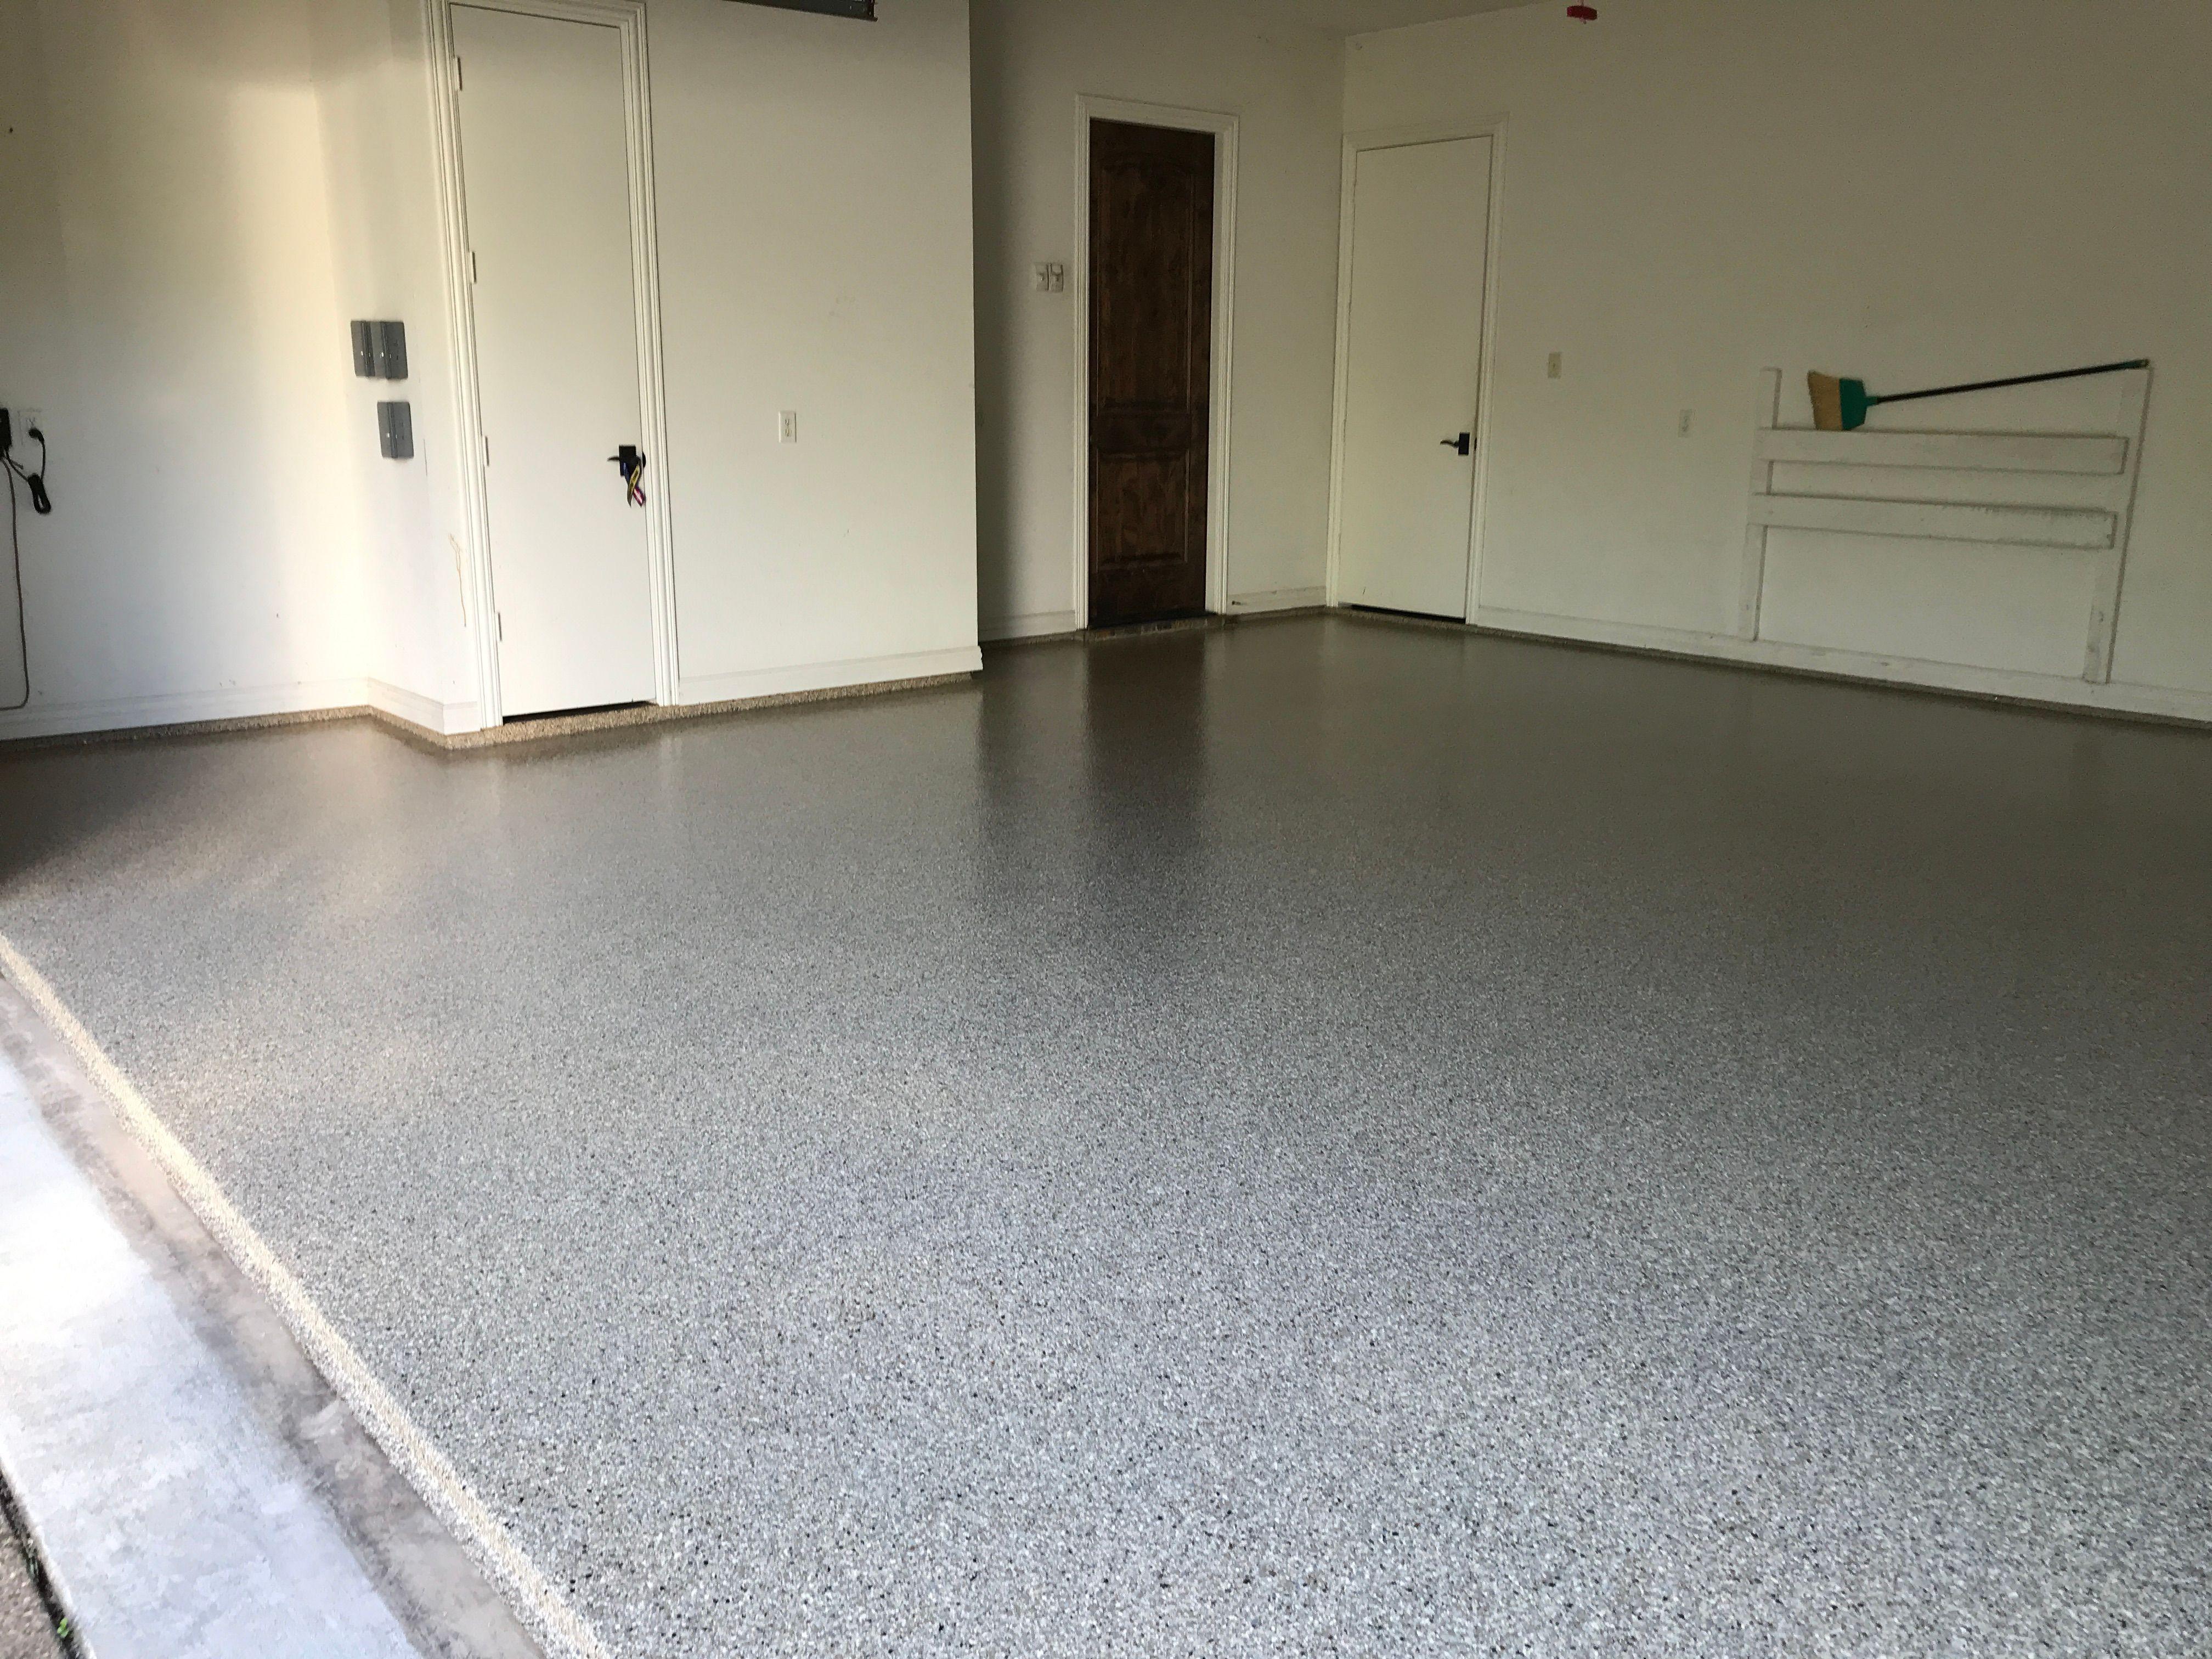 Classic Marble Polyaspartic Garagefloors Customgarage Customfloor Garage Paint Epoxy Garage Floor Coating Garage Floor